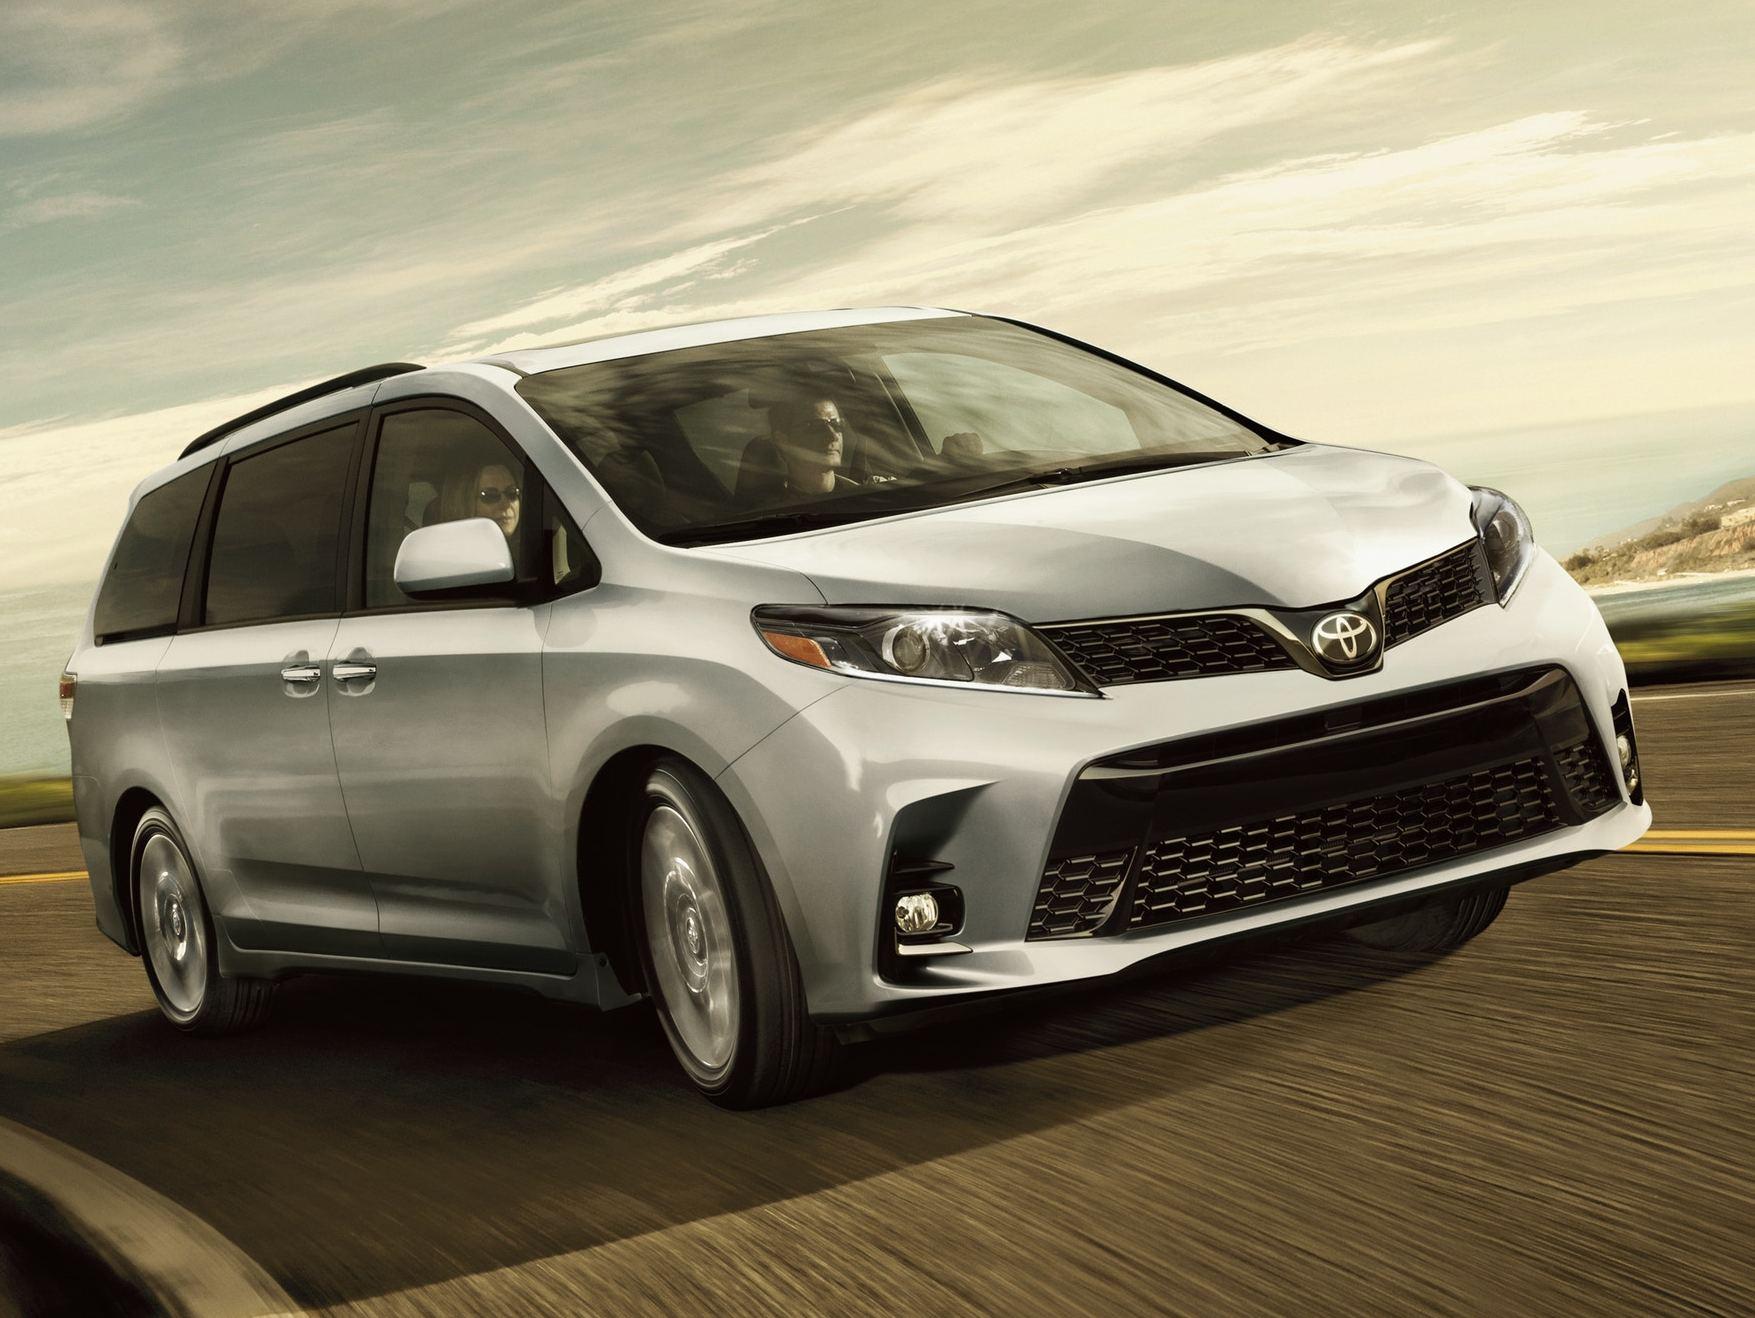 2020 Toyota Sienna Leasing near Bridgewater, NJ